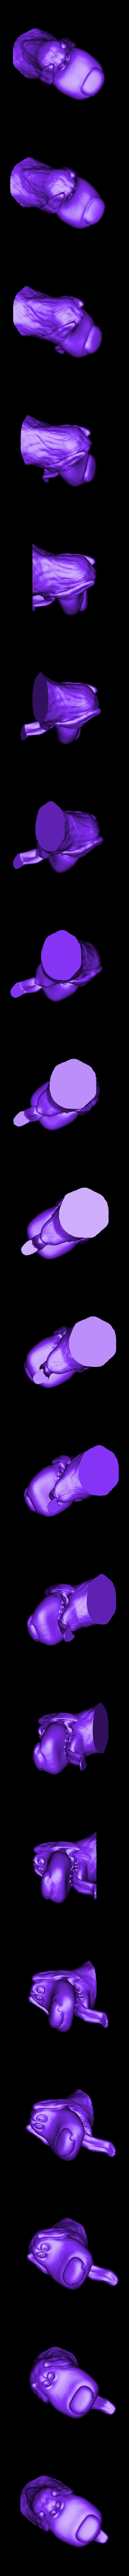 file_bec6b8b3ee78a747782708c8998cf547_5081.stl Download free STL file Dog from Up movie Pixar • 3D printable model, HeribertoDeli3D